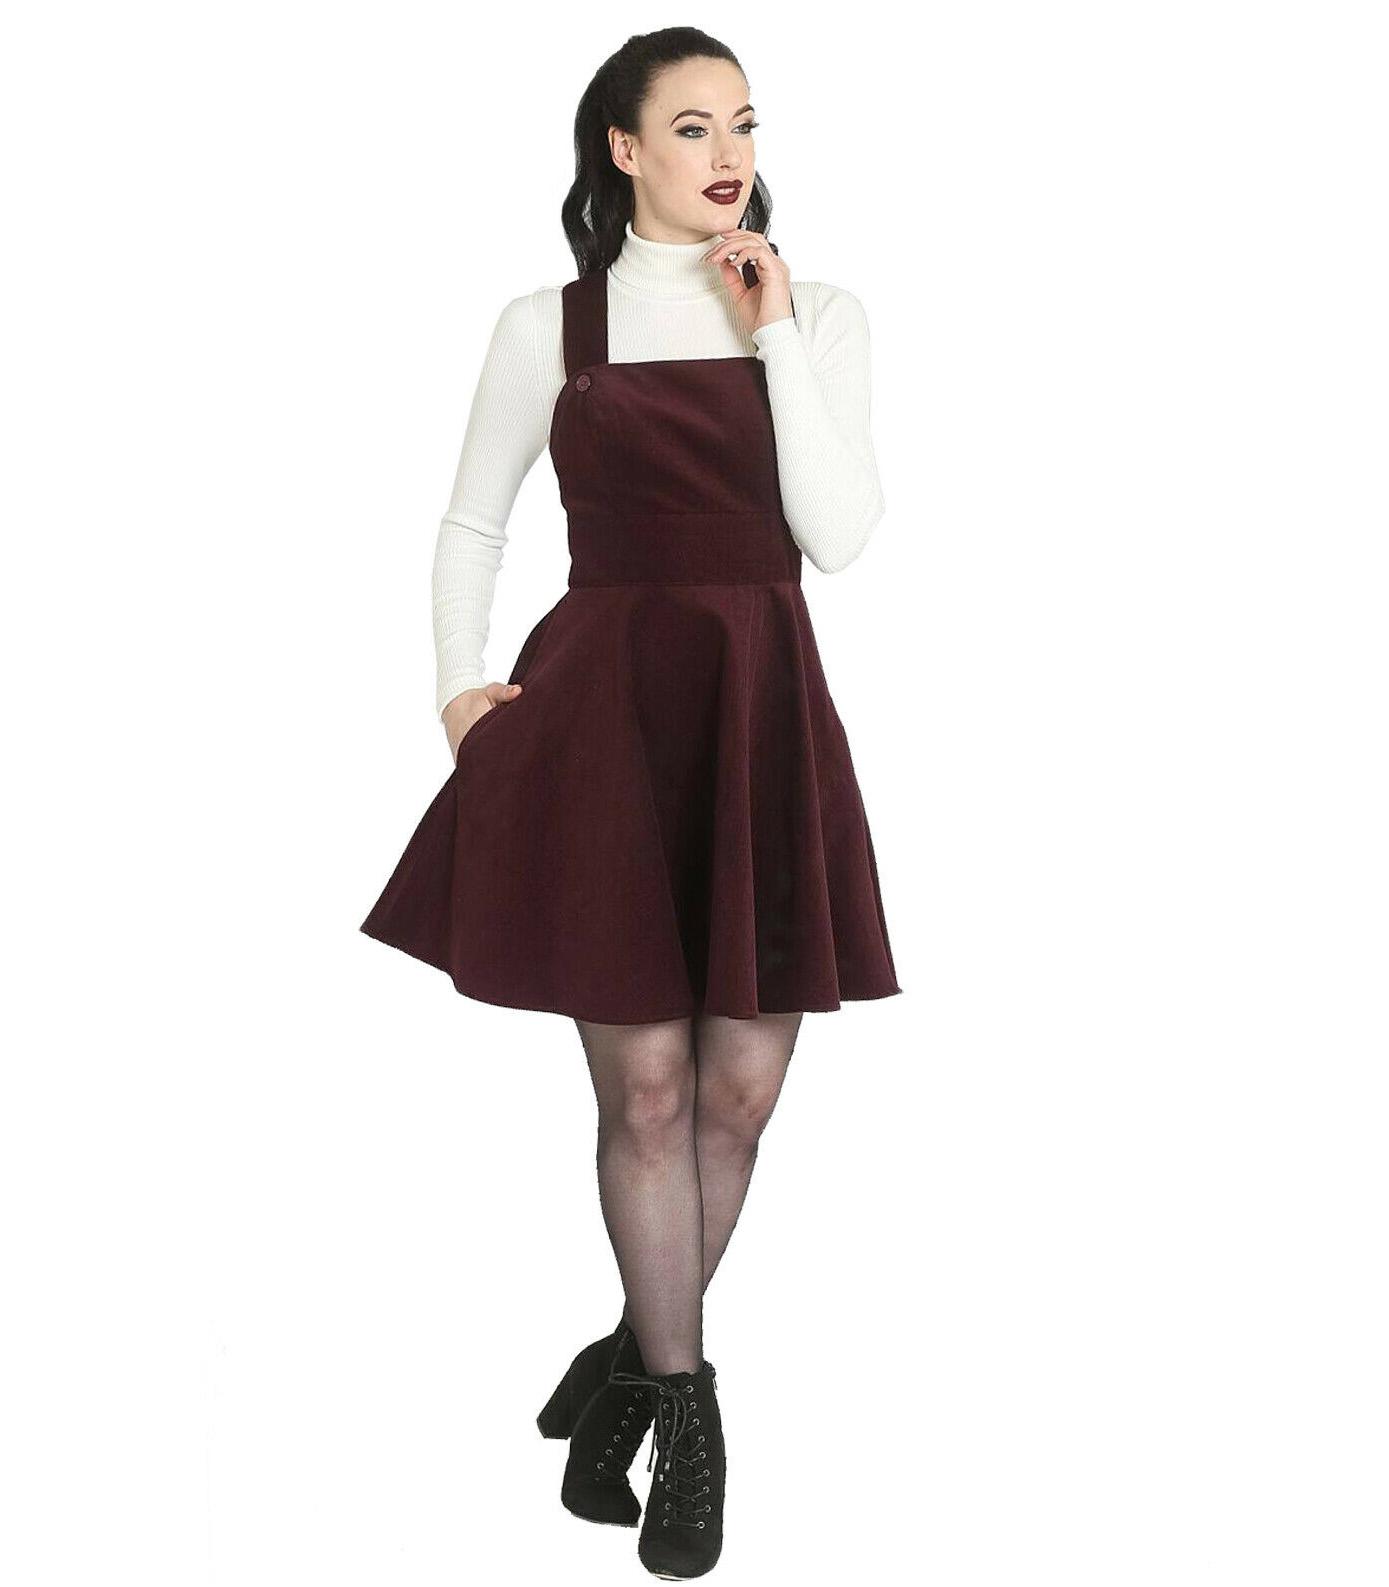 Hell-Bunny-Rockabilly-Corduroy-Mini-Dress-WONDER-YEARS-Pinafore-Wine-All-Sizes thumbnail 23